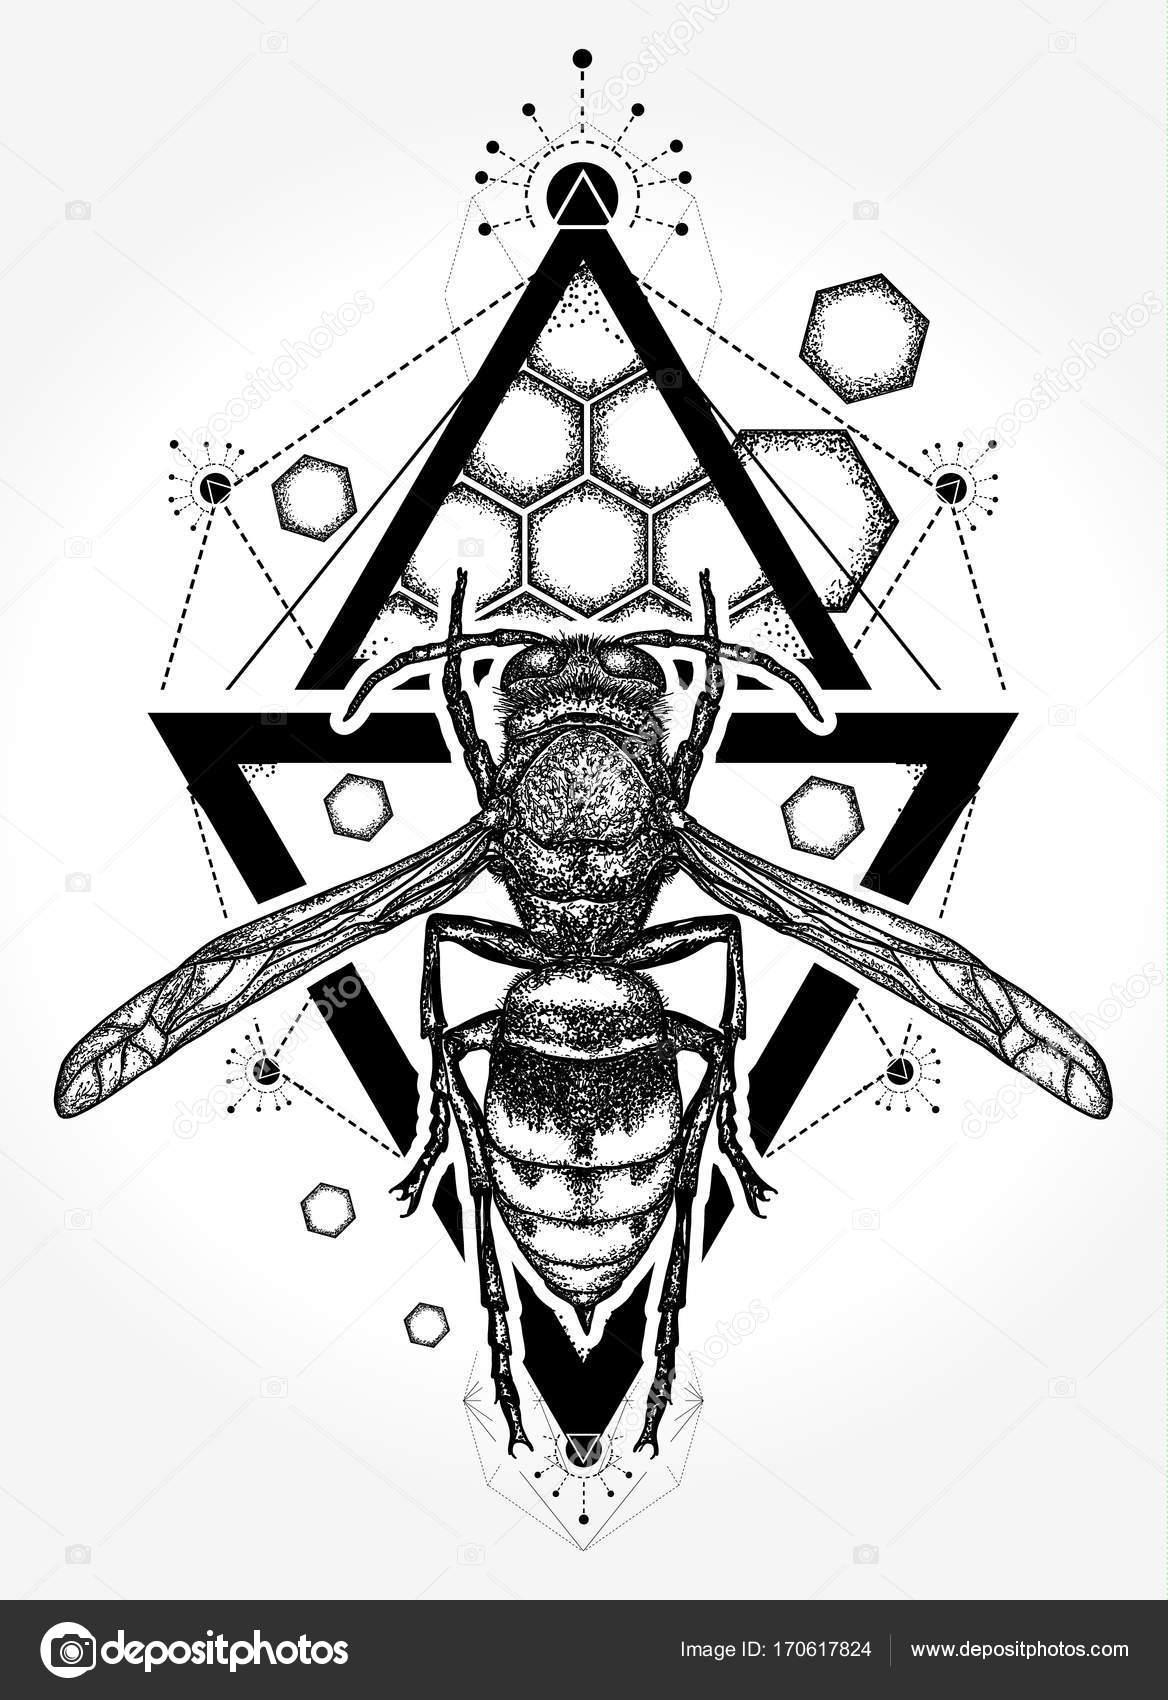 Bee tattoo and t shirt design symbol of freedom flight stock symbol of freedom flight stock vector biocorpaavc